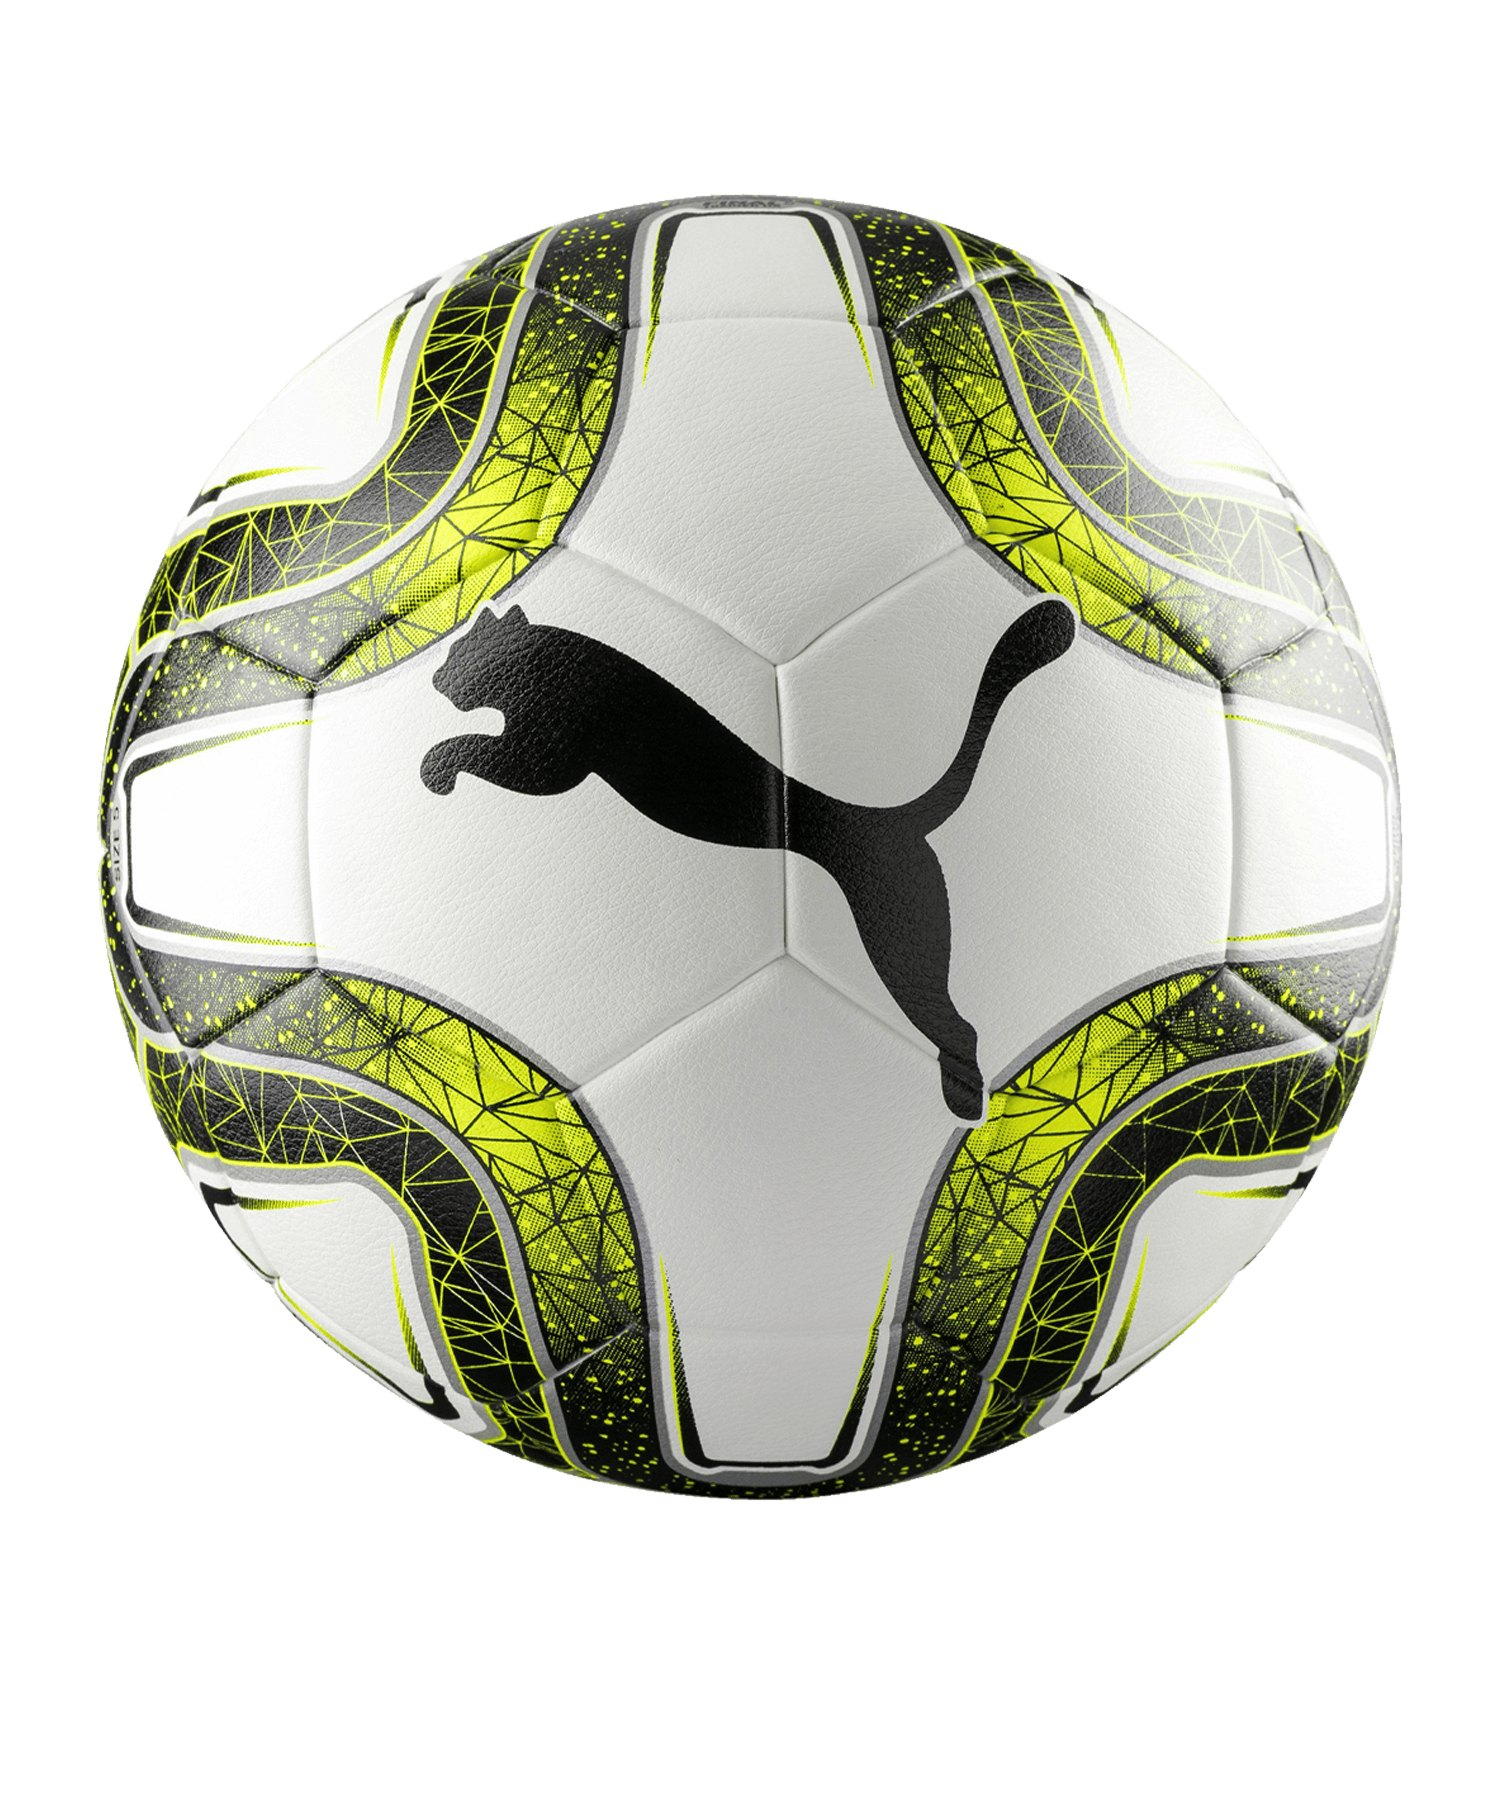 PUMA FINAL 5 Hardground Fussball F01 - weiss